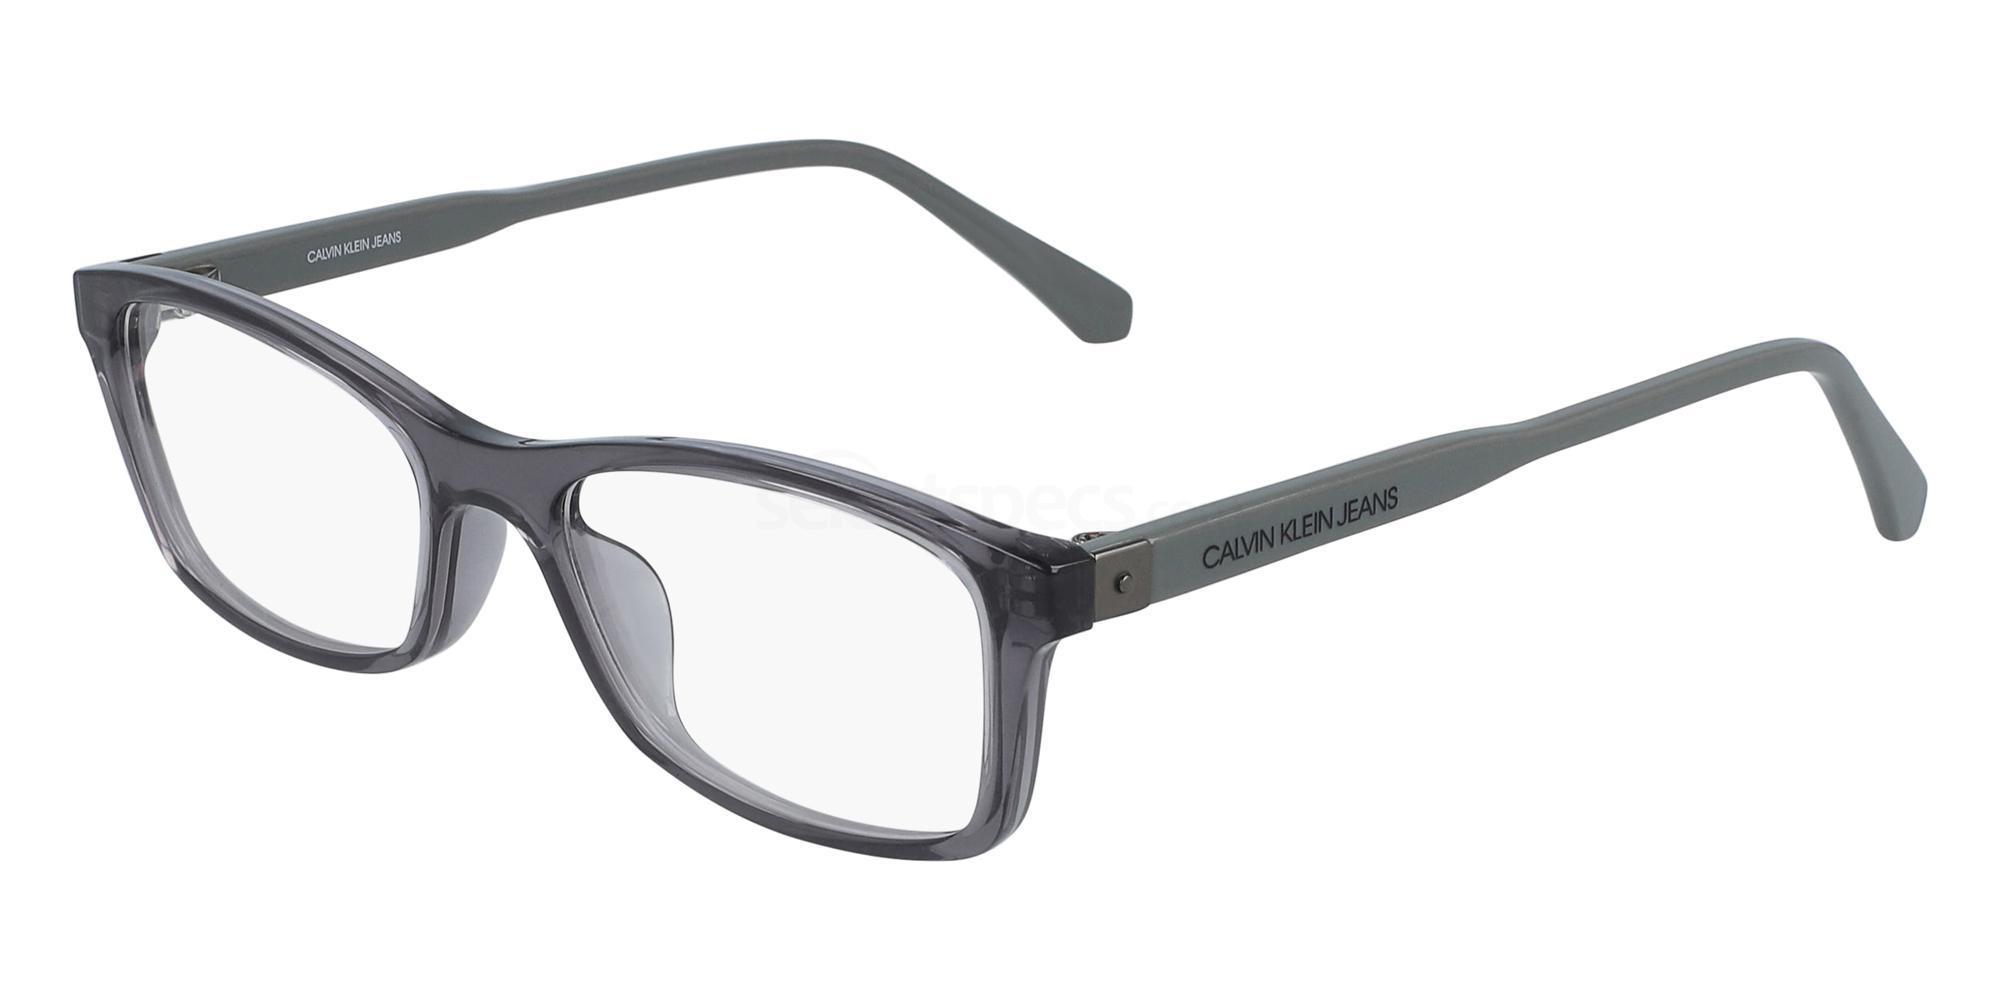 006 CKJ19523 Glasses, Calvin Klein Jeans